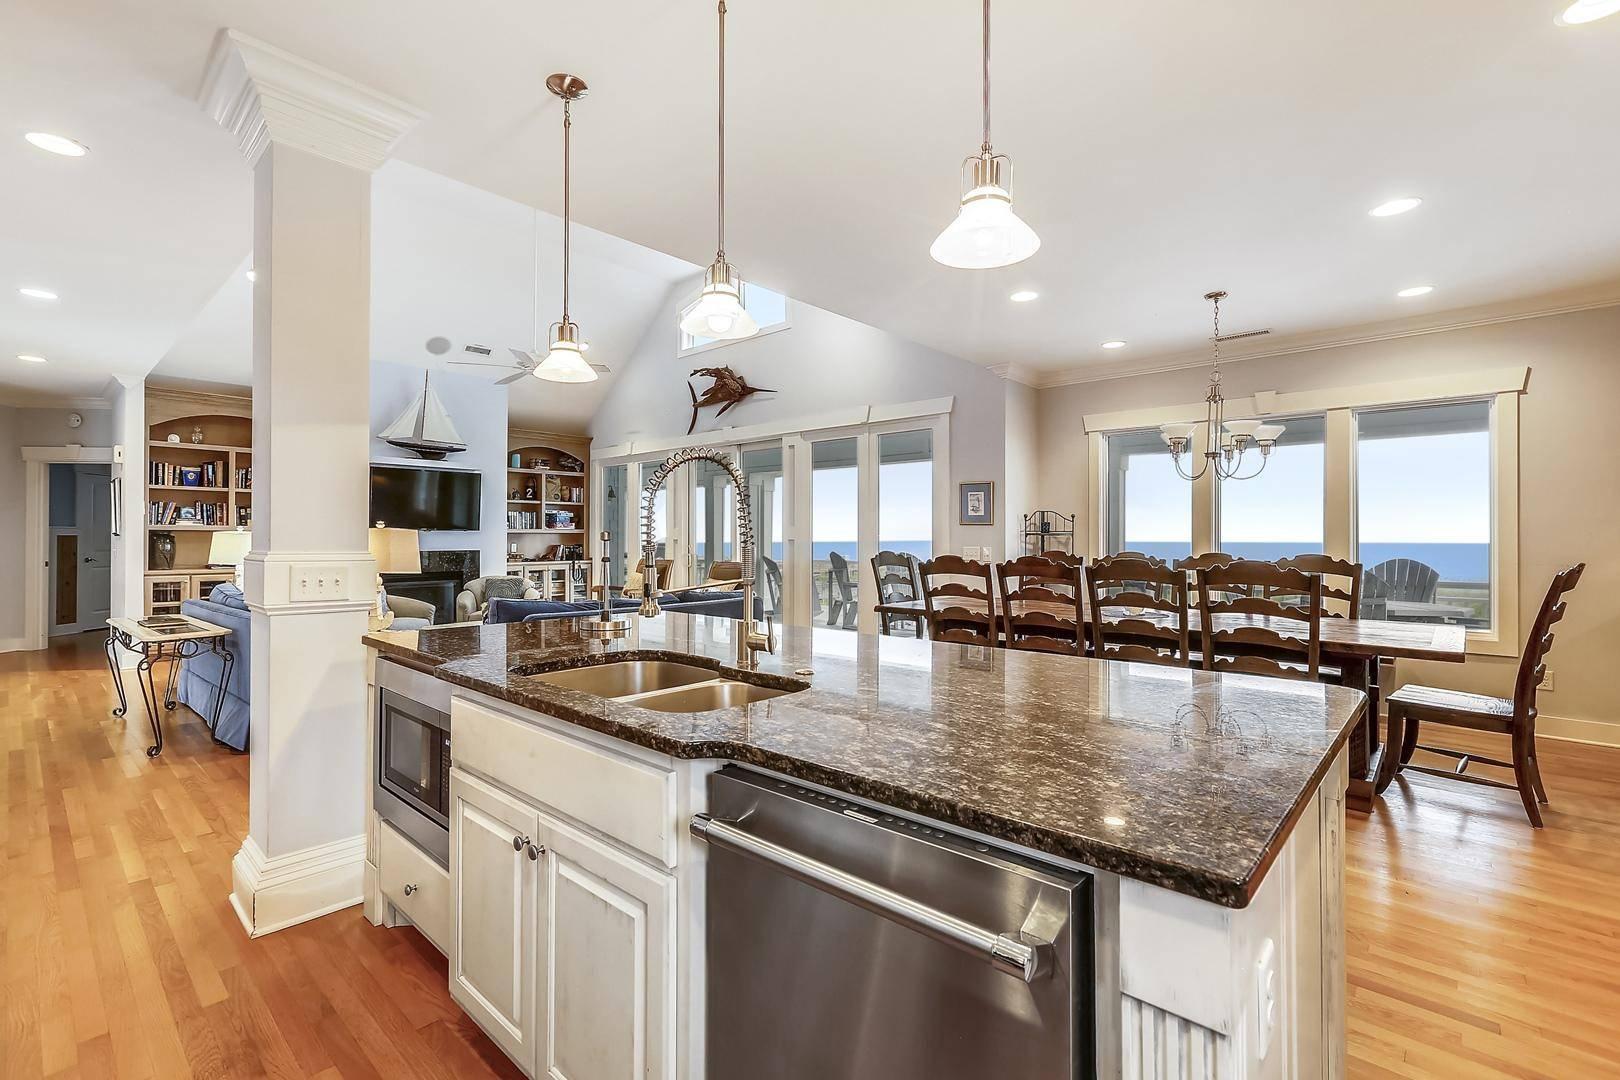 oak island holidays, oak island rentals with large kitchens